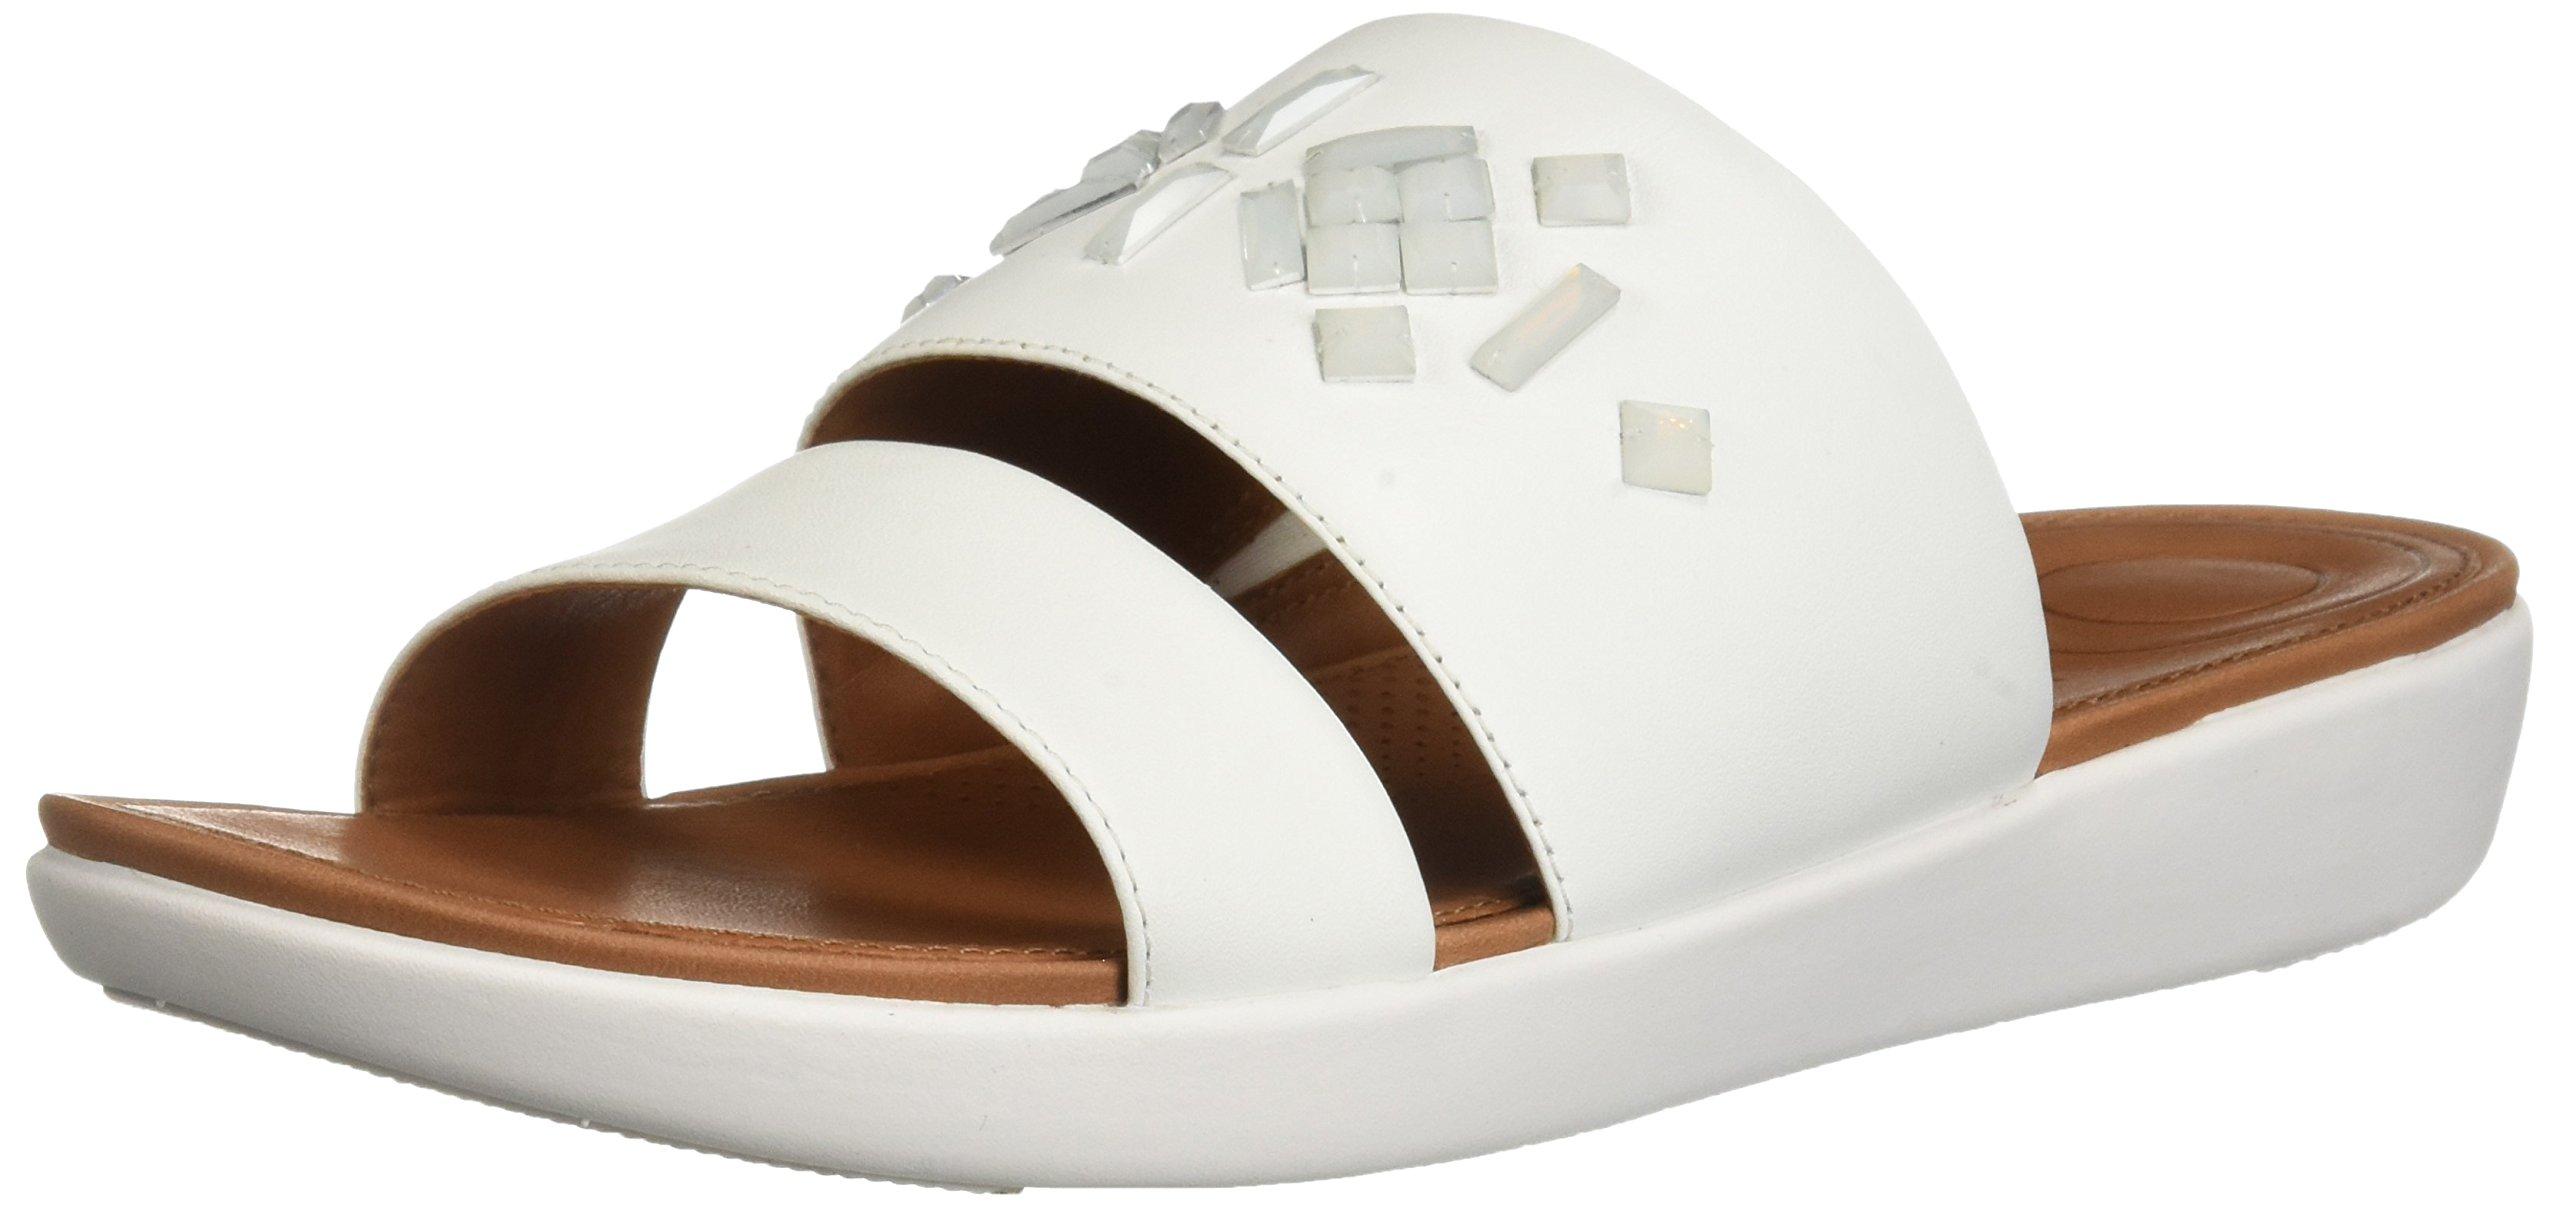 FitFlop Women's Delta Leather Crystal Slide Sandal, Urban White, 6 M US